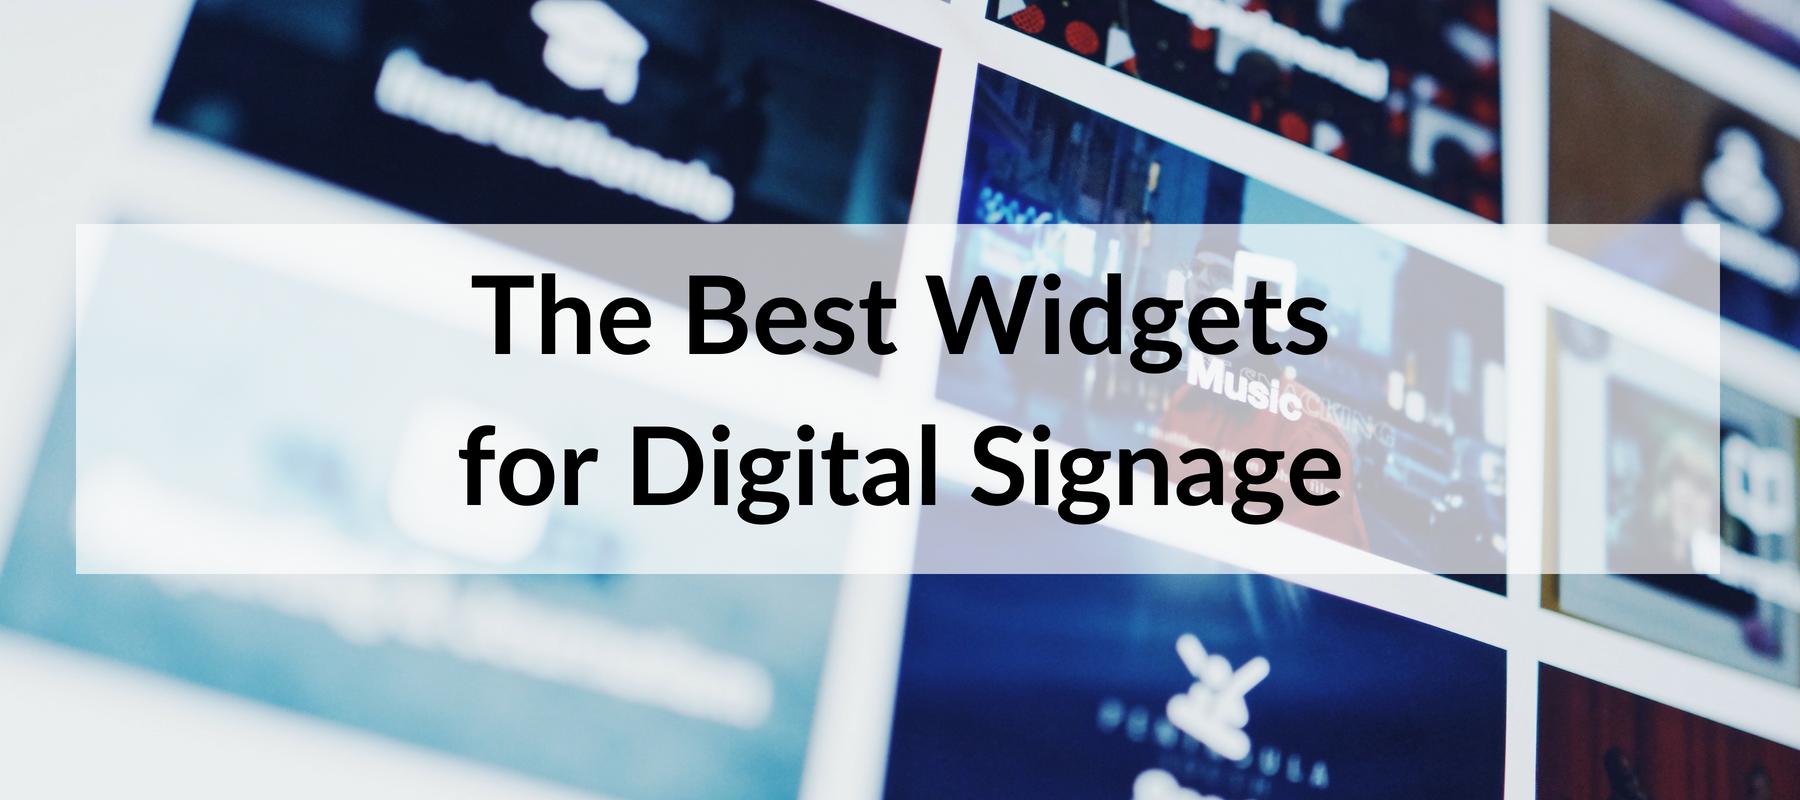 The Best Widgets for Digital Signage